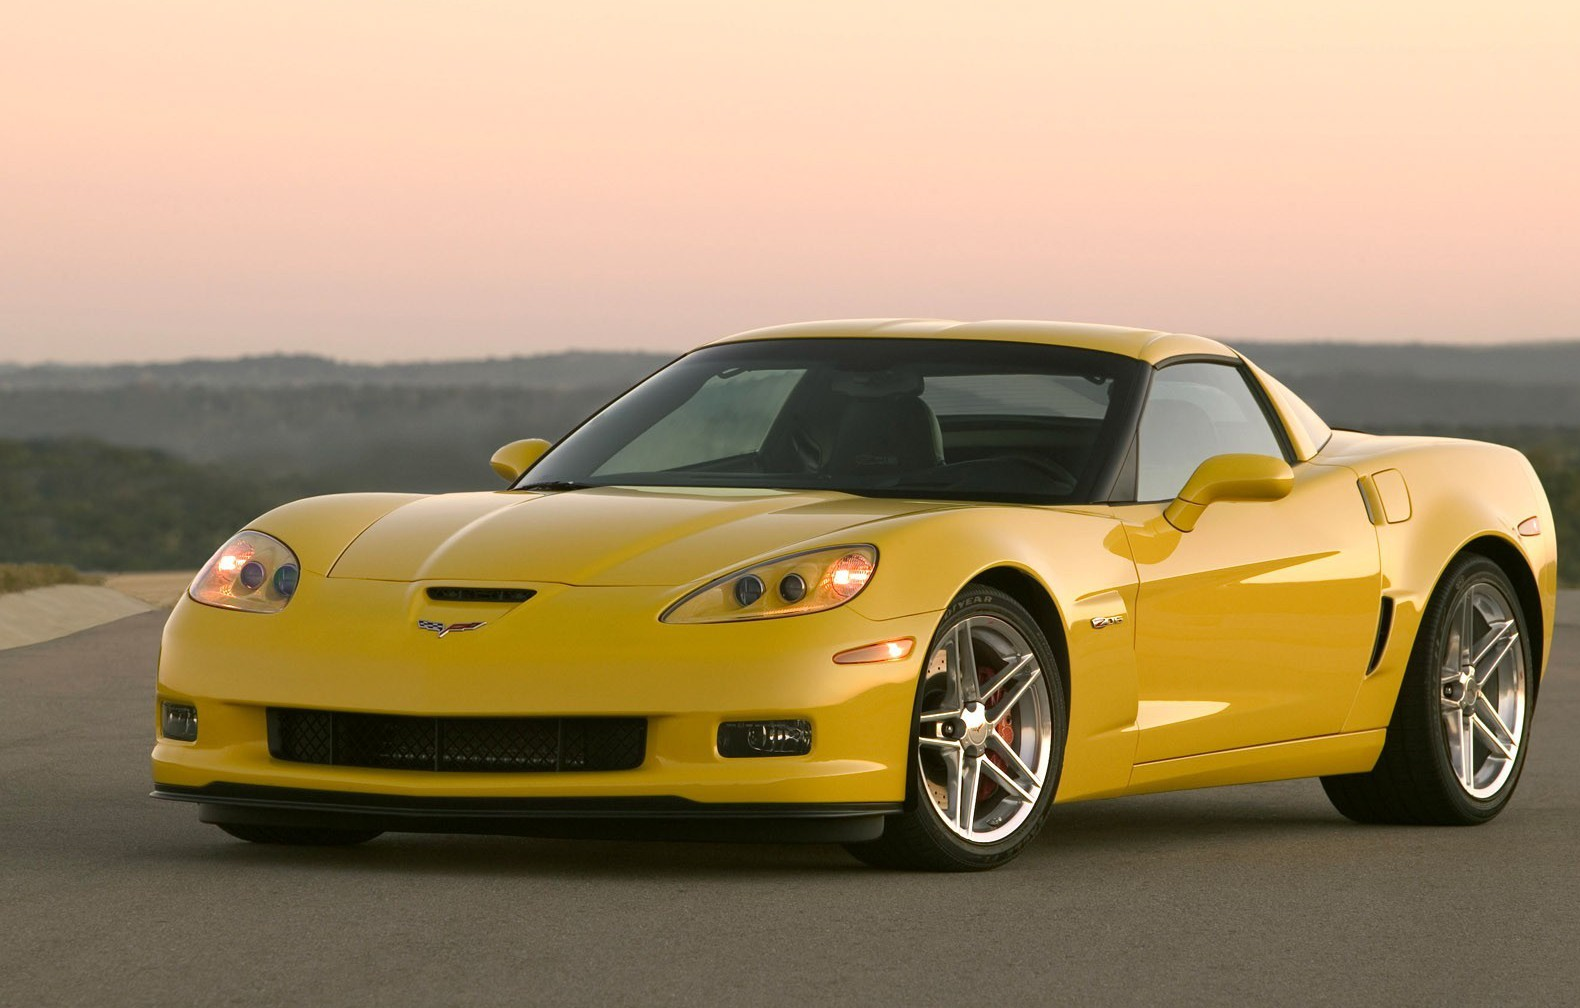 C6 Corvette Owners File Lawsuit Against General Motors